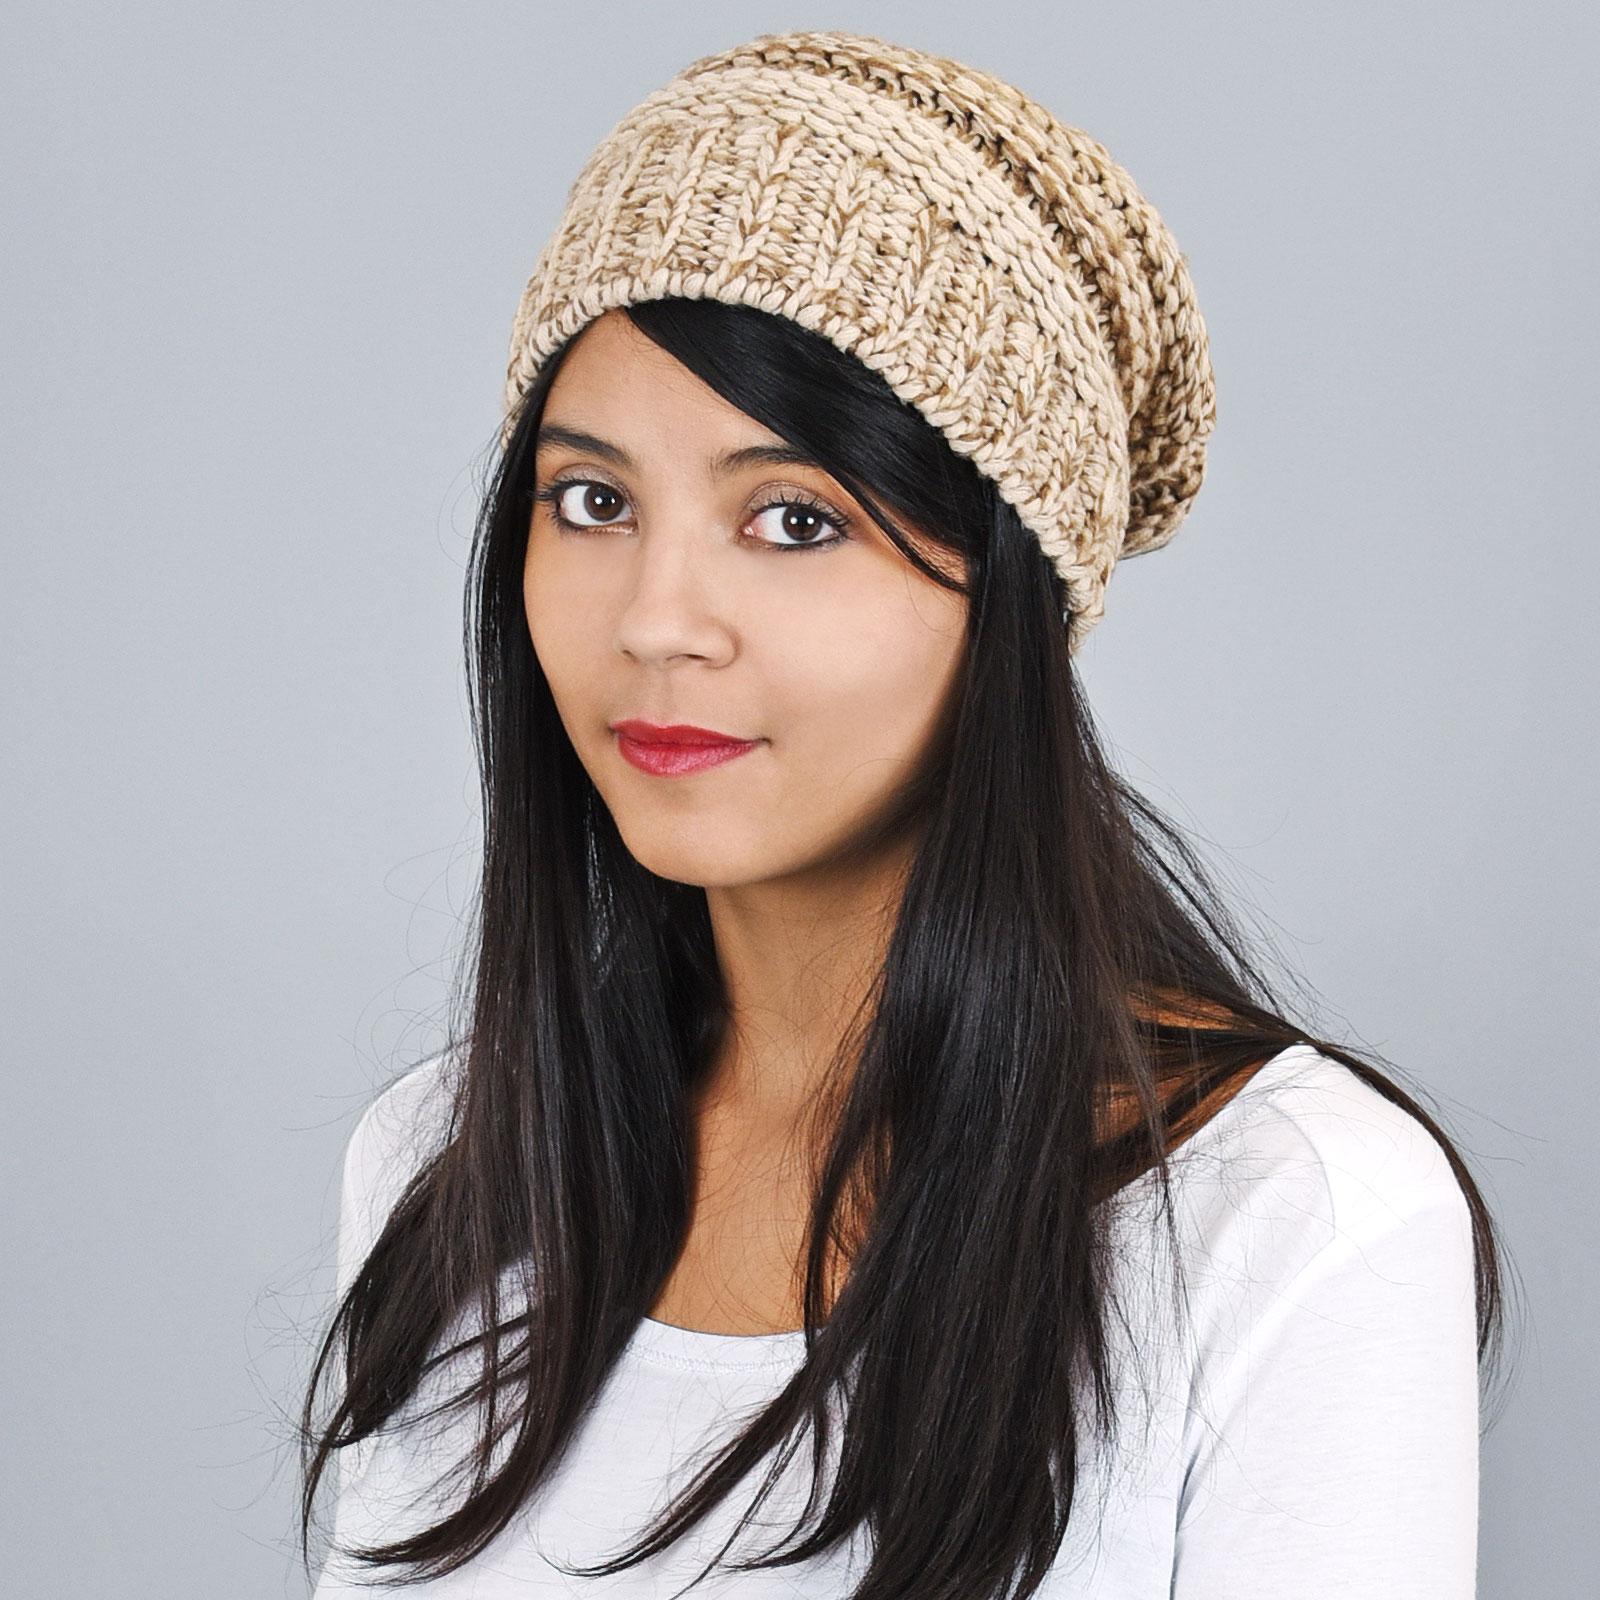 CP-00609-VF16-bonnet-beige-bump